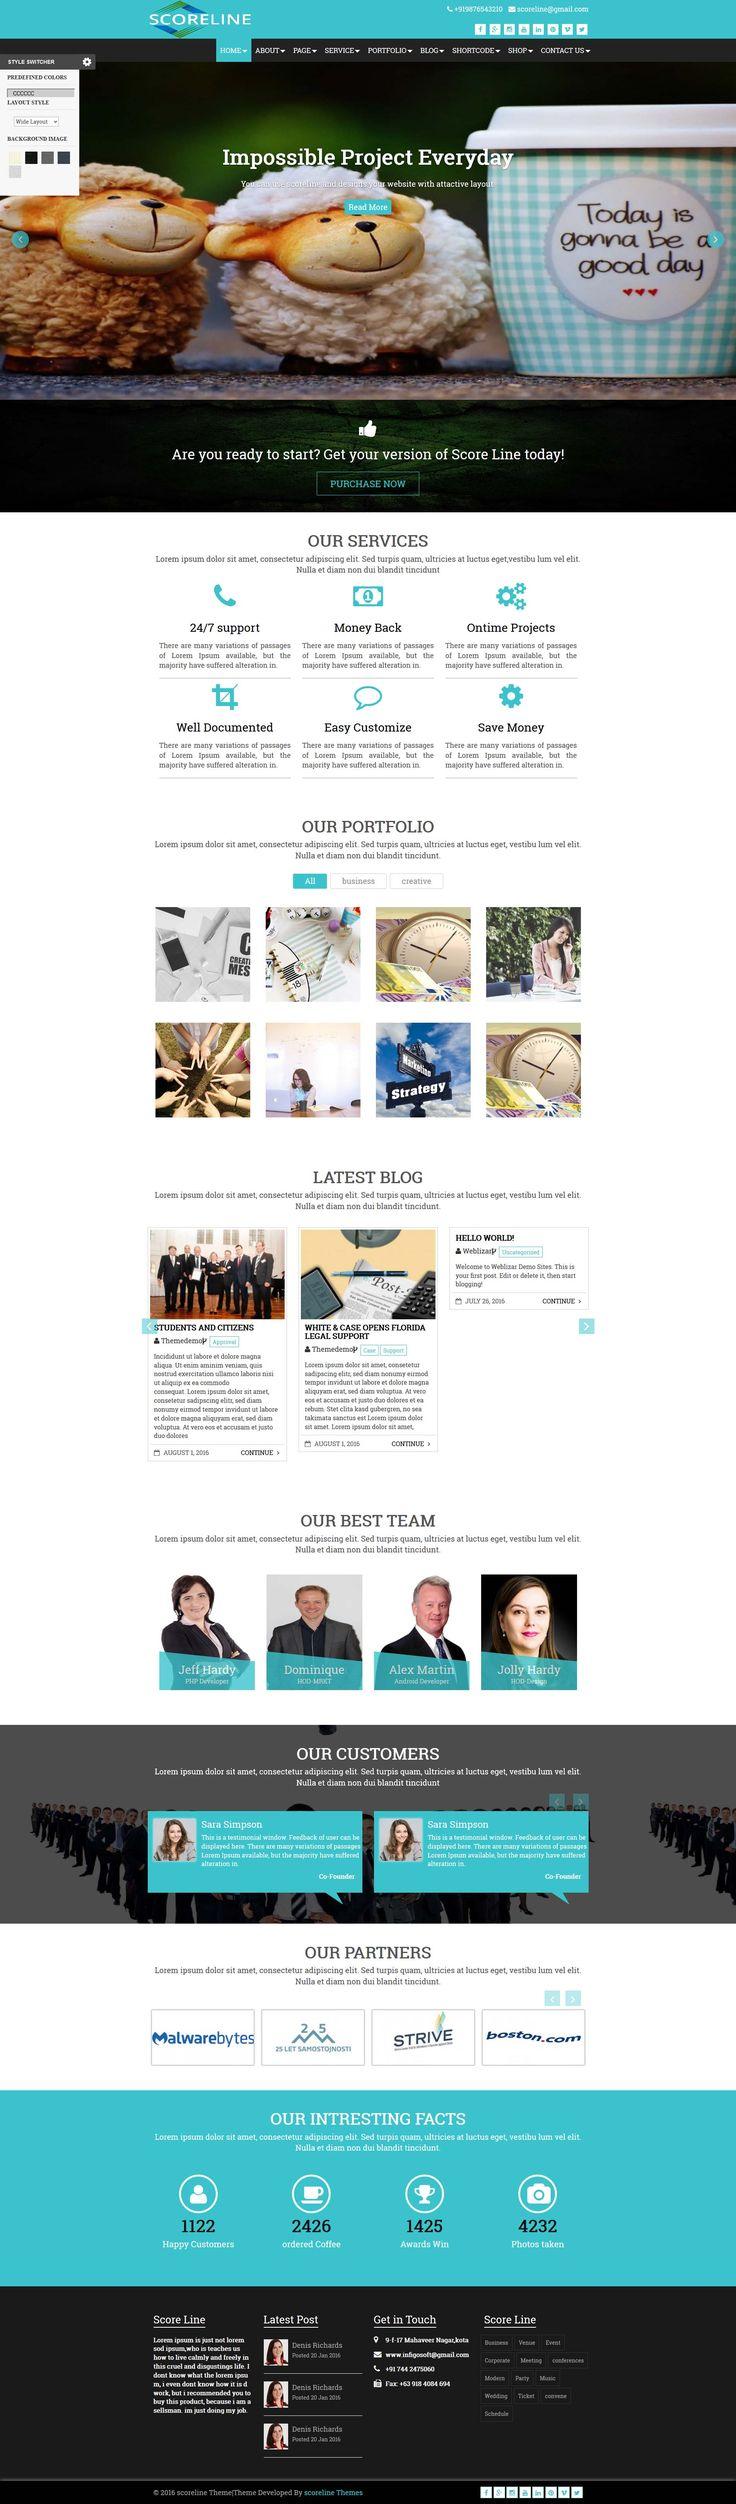 Scoreline Premium WordPress Theme